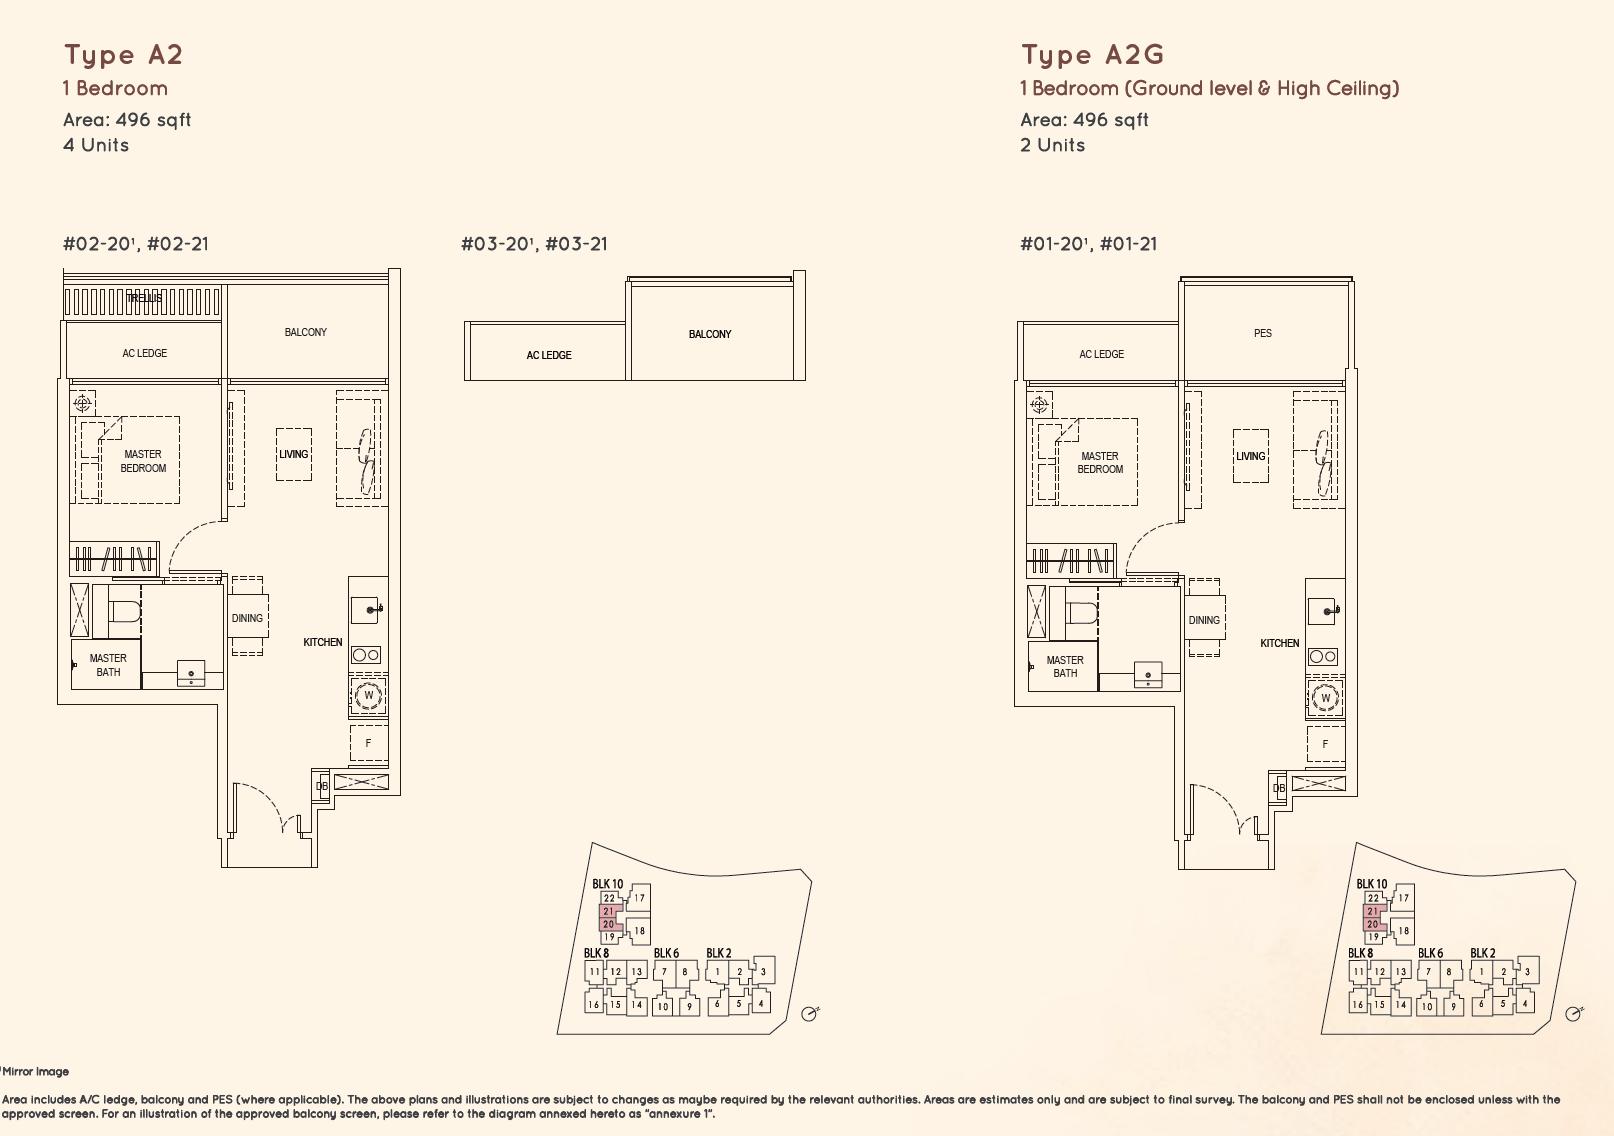 Kandis Residence 1 bedroom floor plan type A2